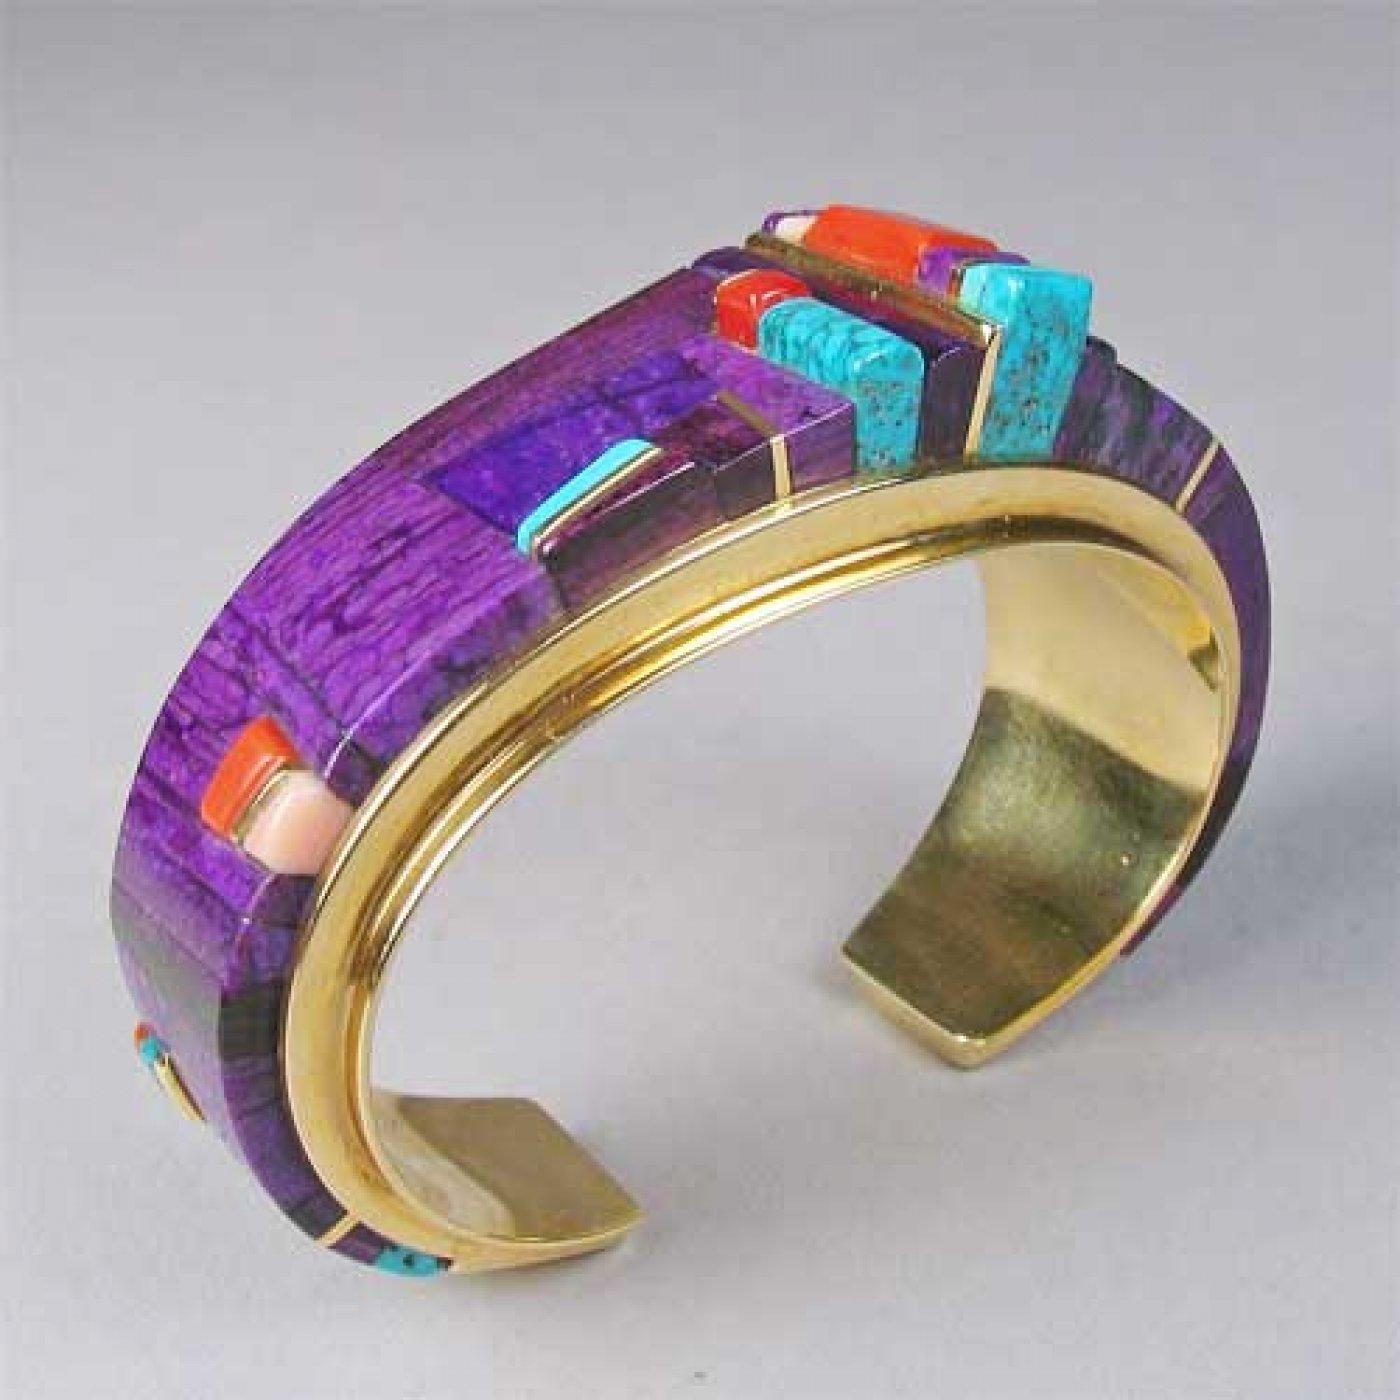 Charles Loloma 18k Gold And Sugilite Bracelet Shiprock